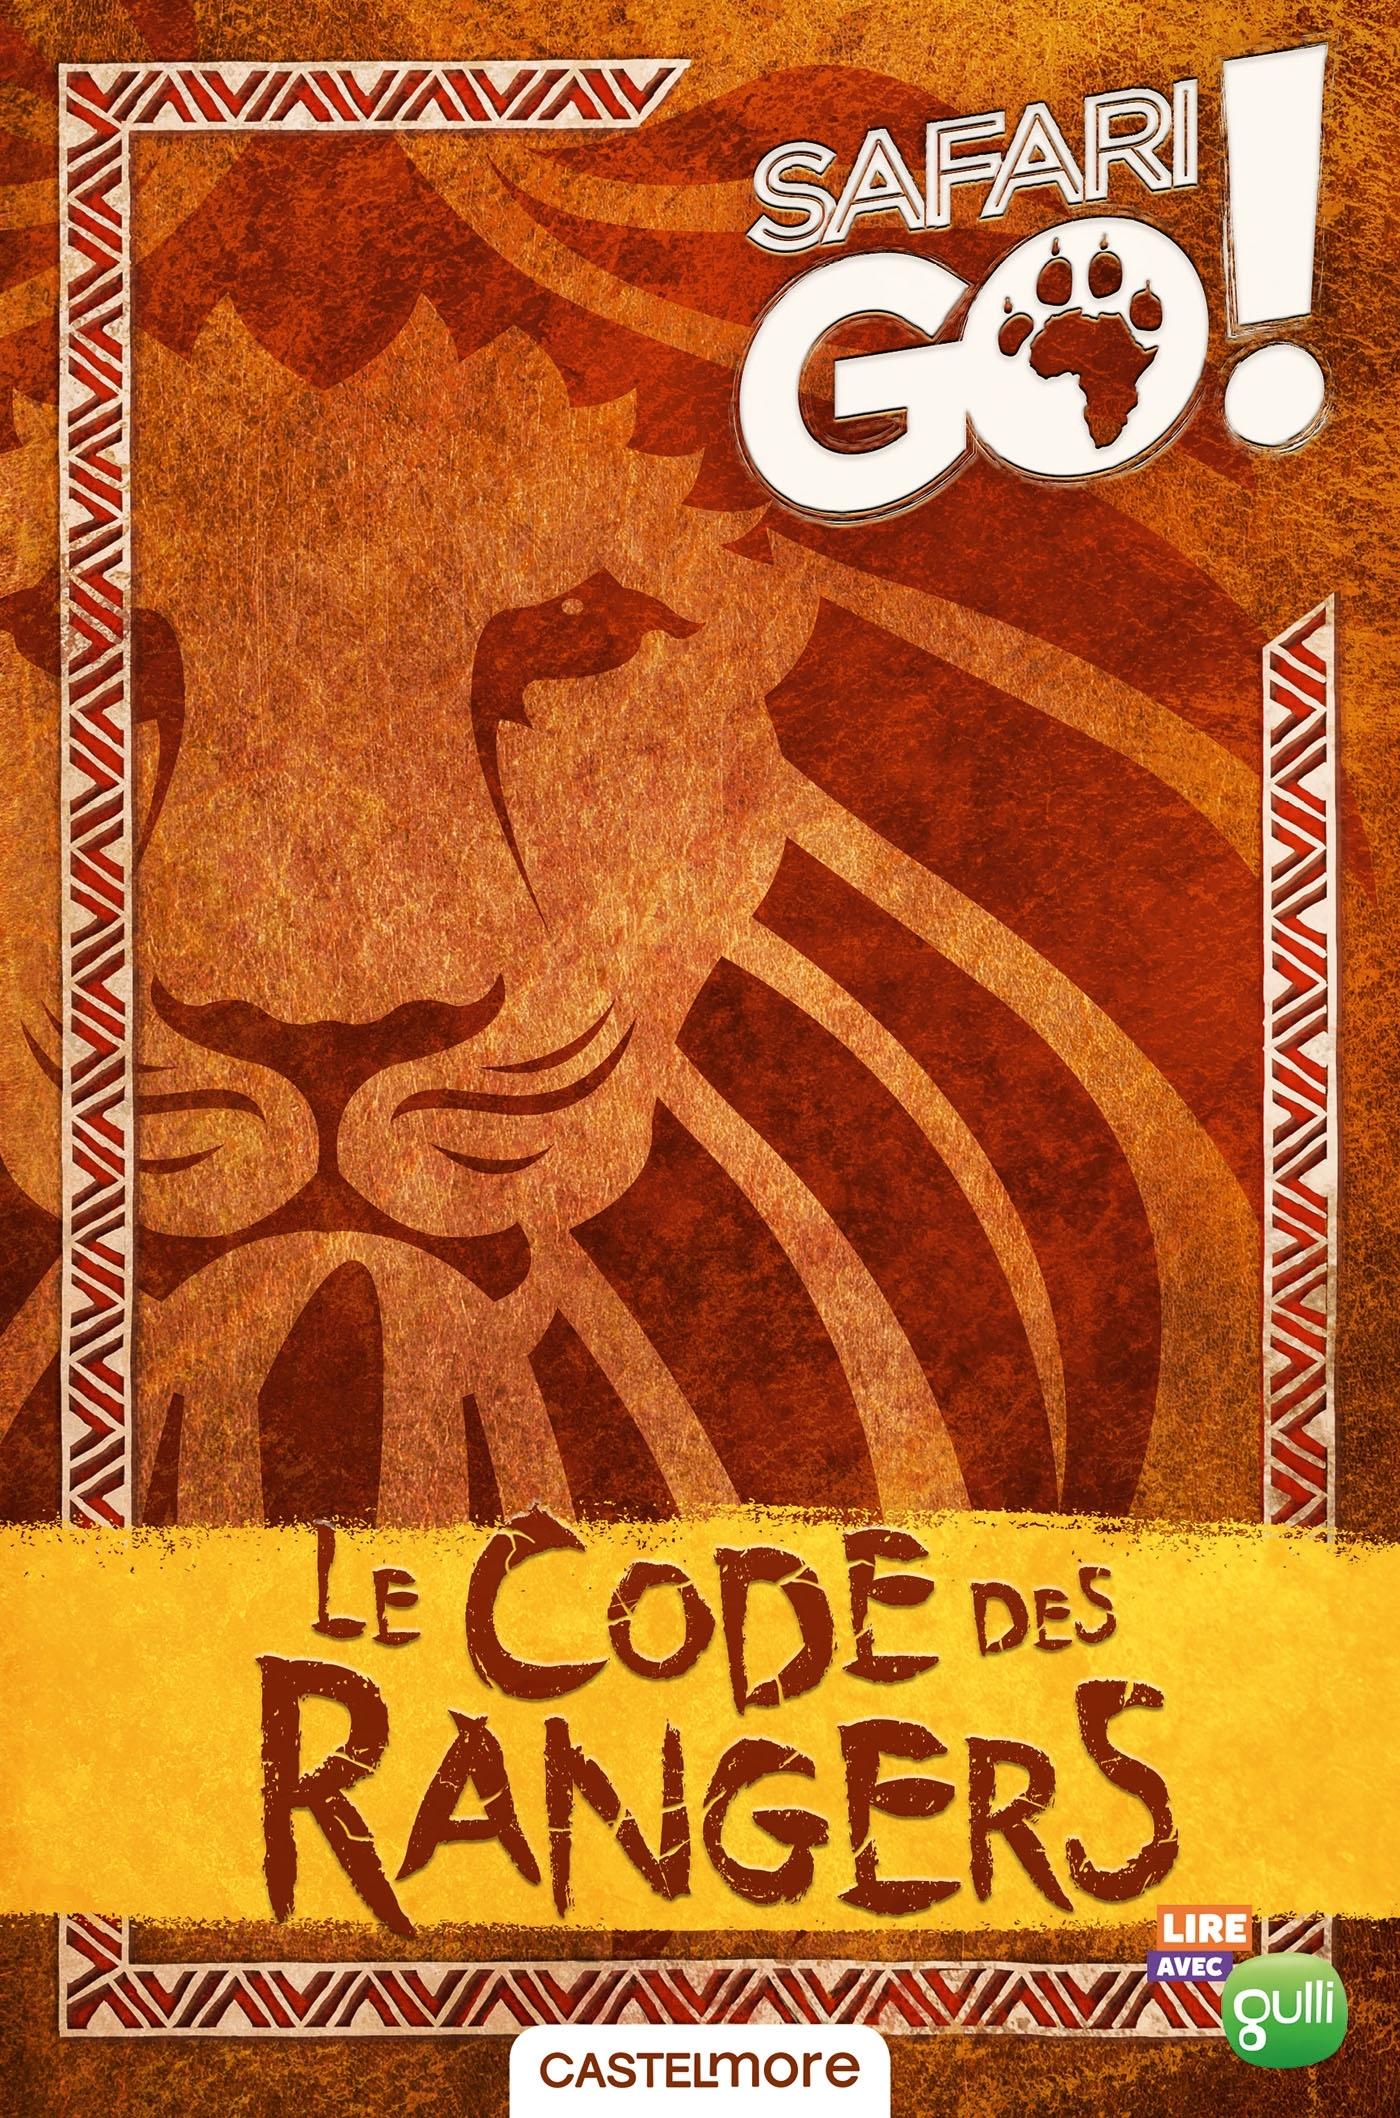 LE CODE DES RANGERS - SAFARI GO !